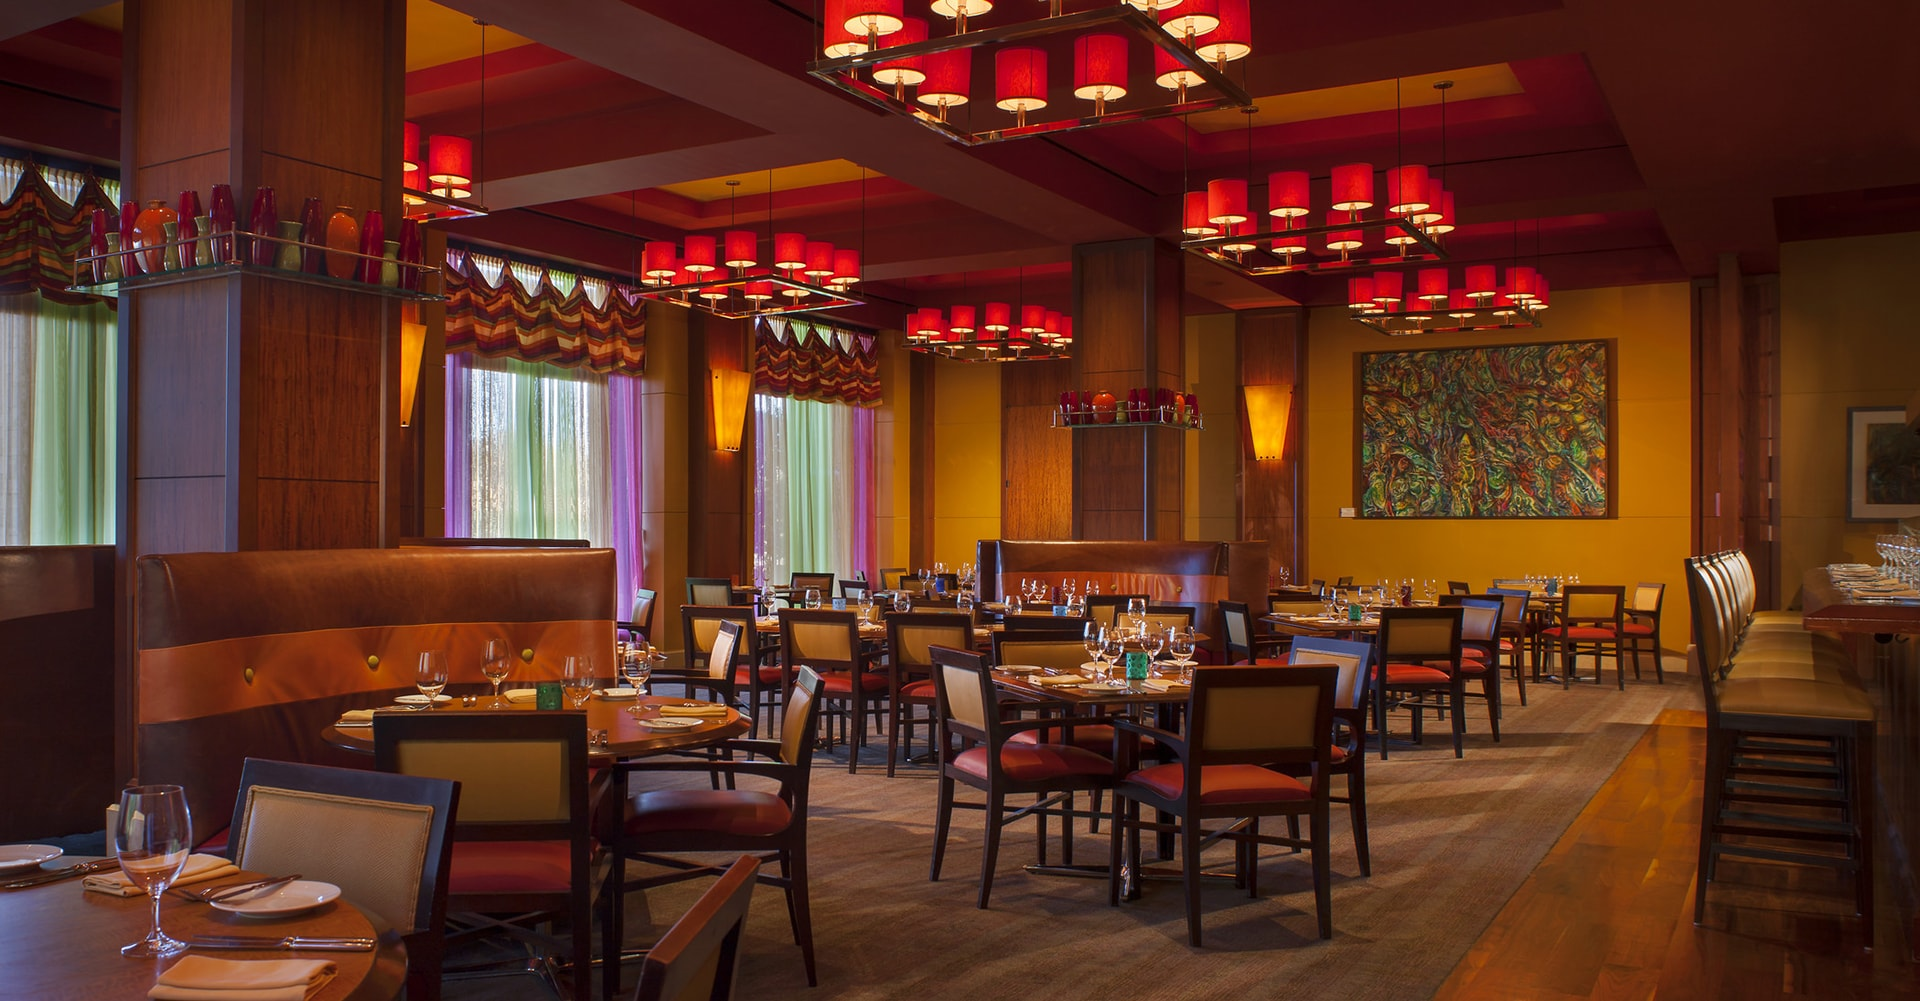 Kierland Westin Resort Desco Restaurant In Scottsdale Arizona